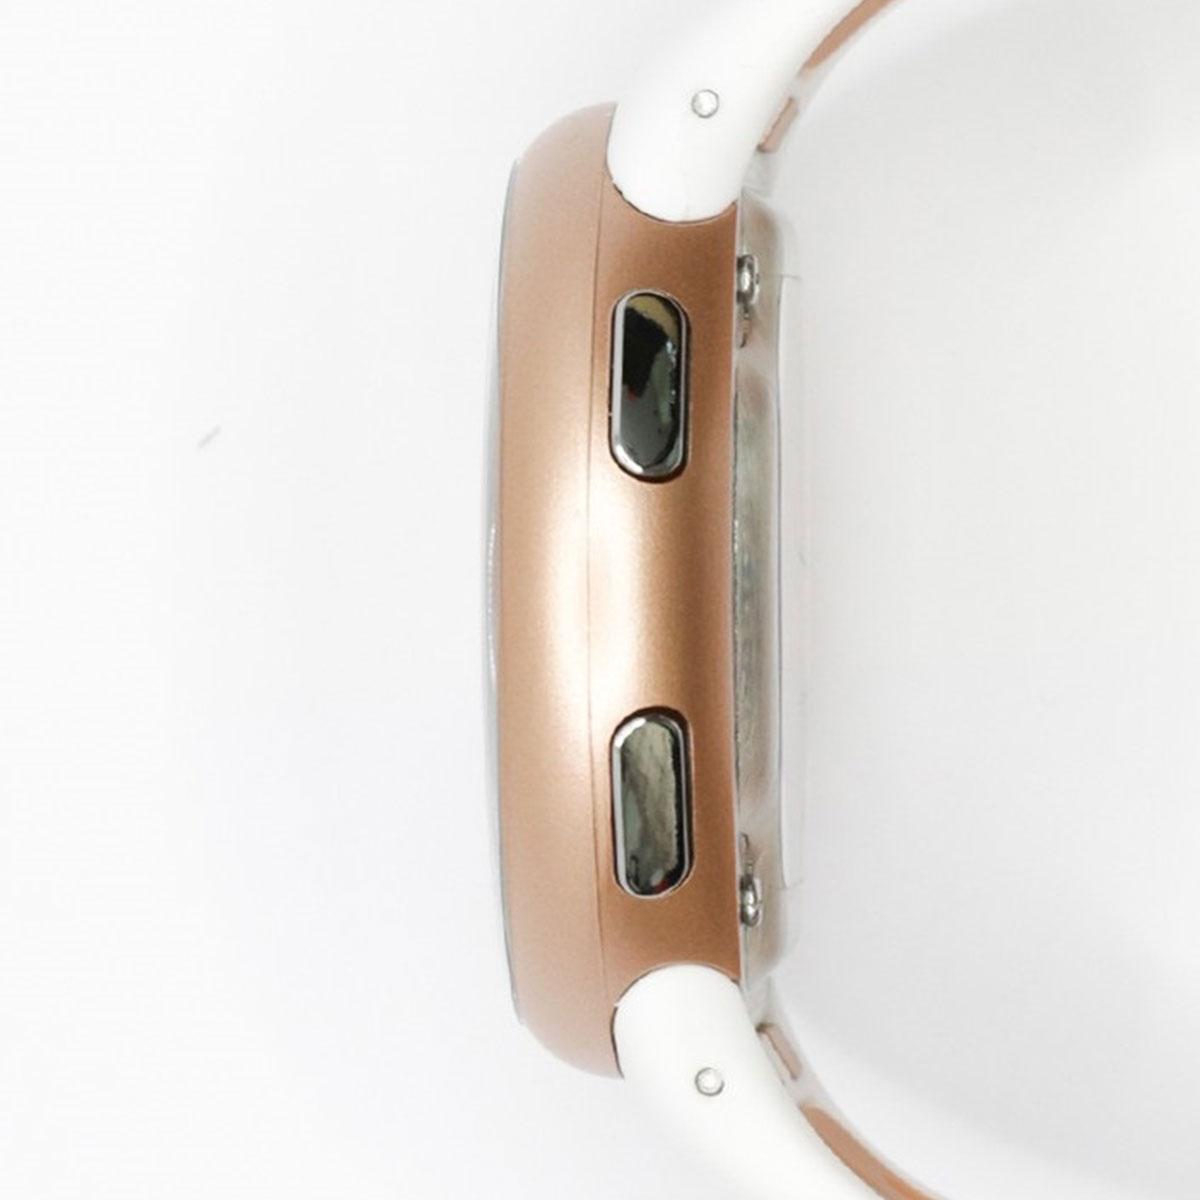 ساعت مچی دیجیتال مردانه ریباک مدل RD-ELE-G9-P3IW-W3             قیمت